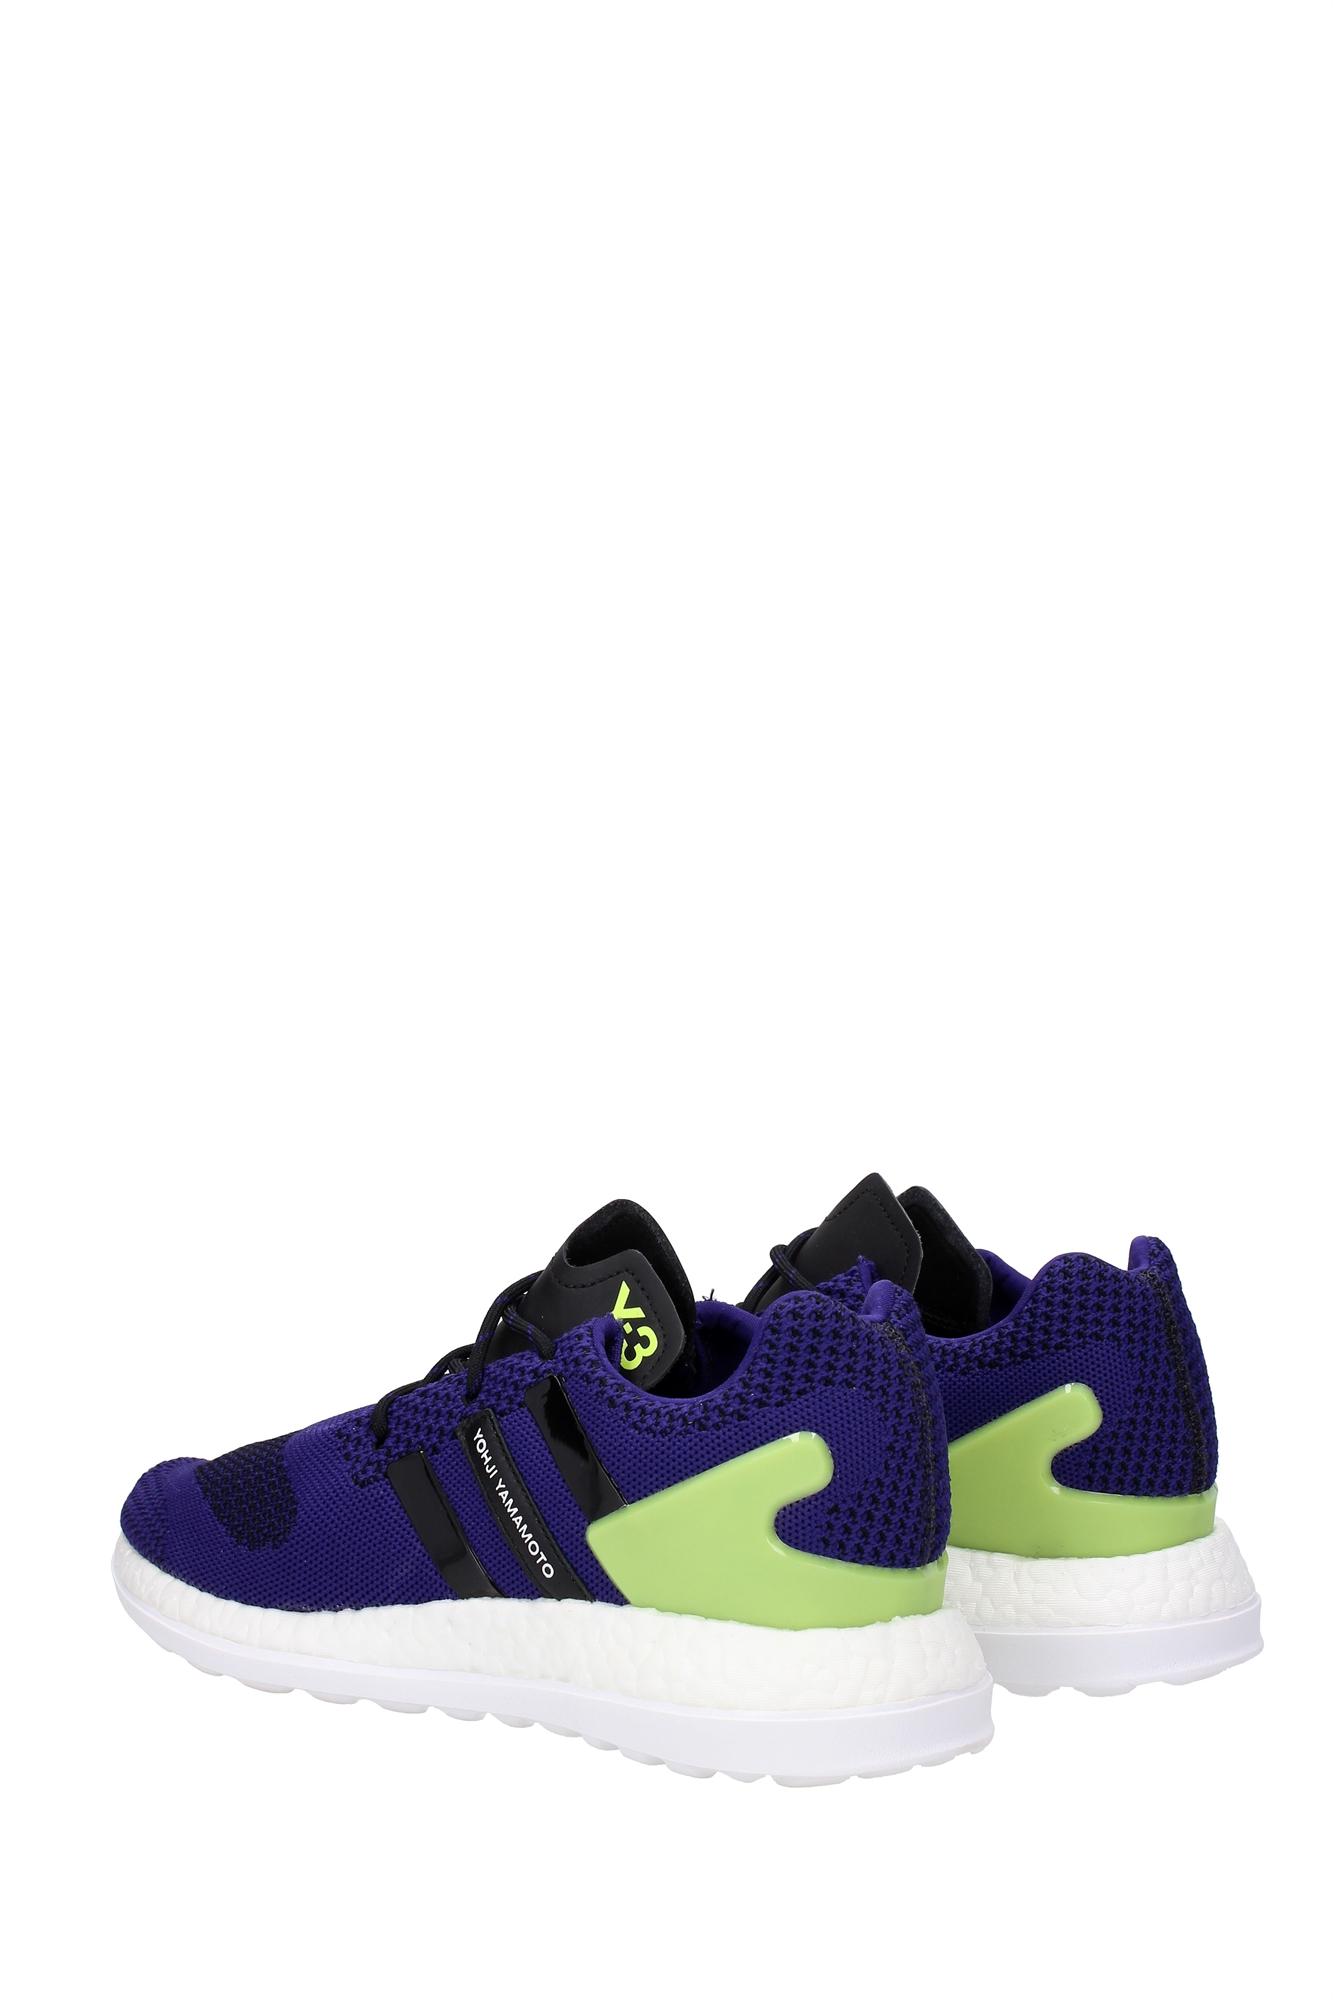 sneakers yamamoto y3 herren stoff violett pureboostaq5730cpurpl ebay. Black Bedroom Furniture Sets. Home Design Ideas